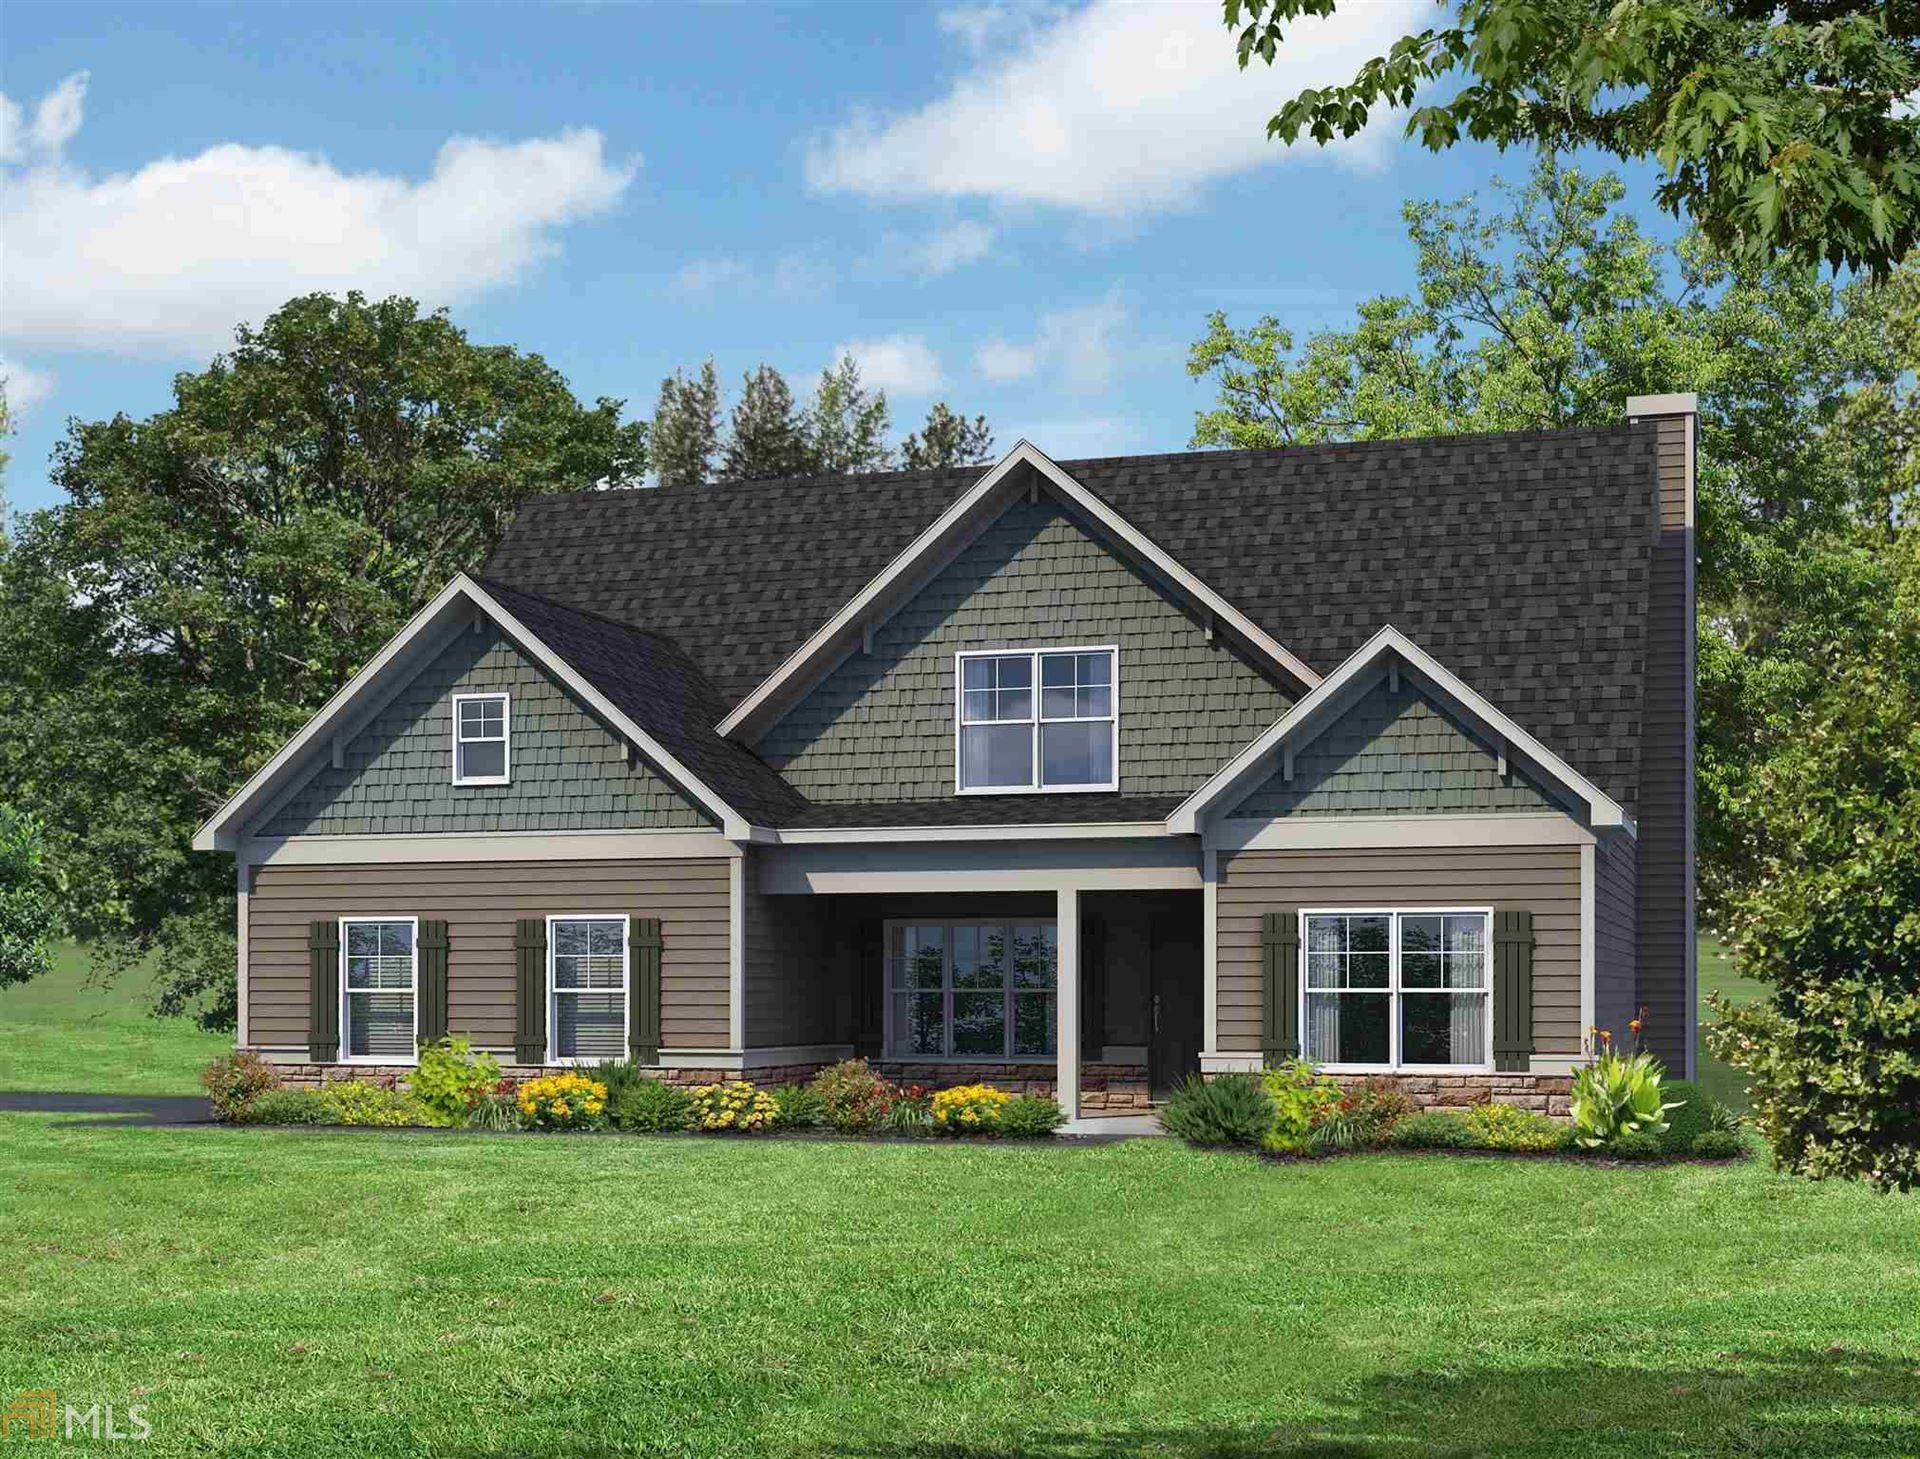 305 South Ridge, Senoia, GA 30276 - MLS#: 8896492